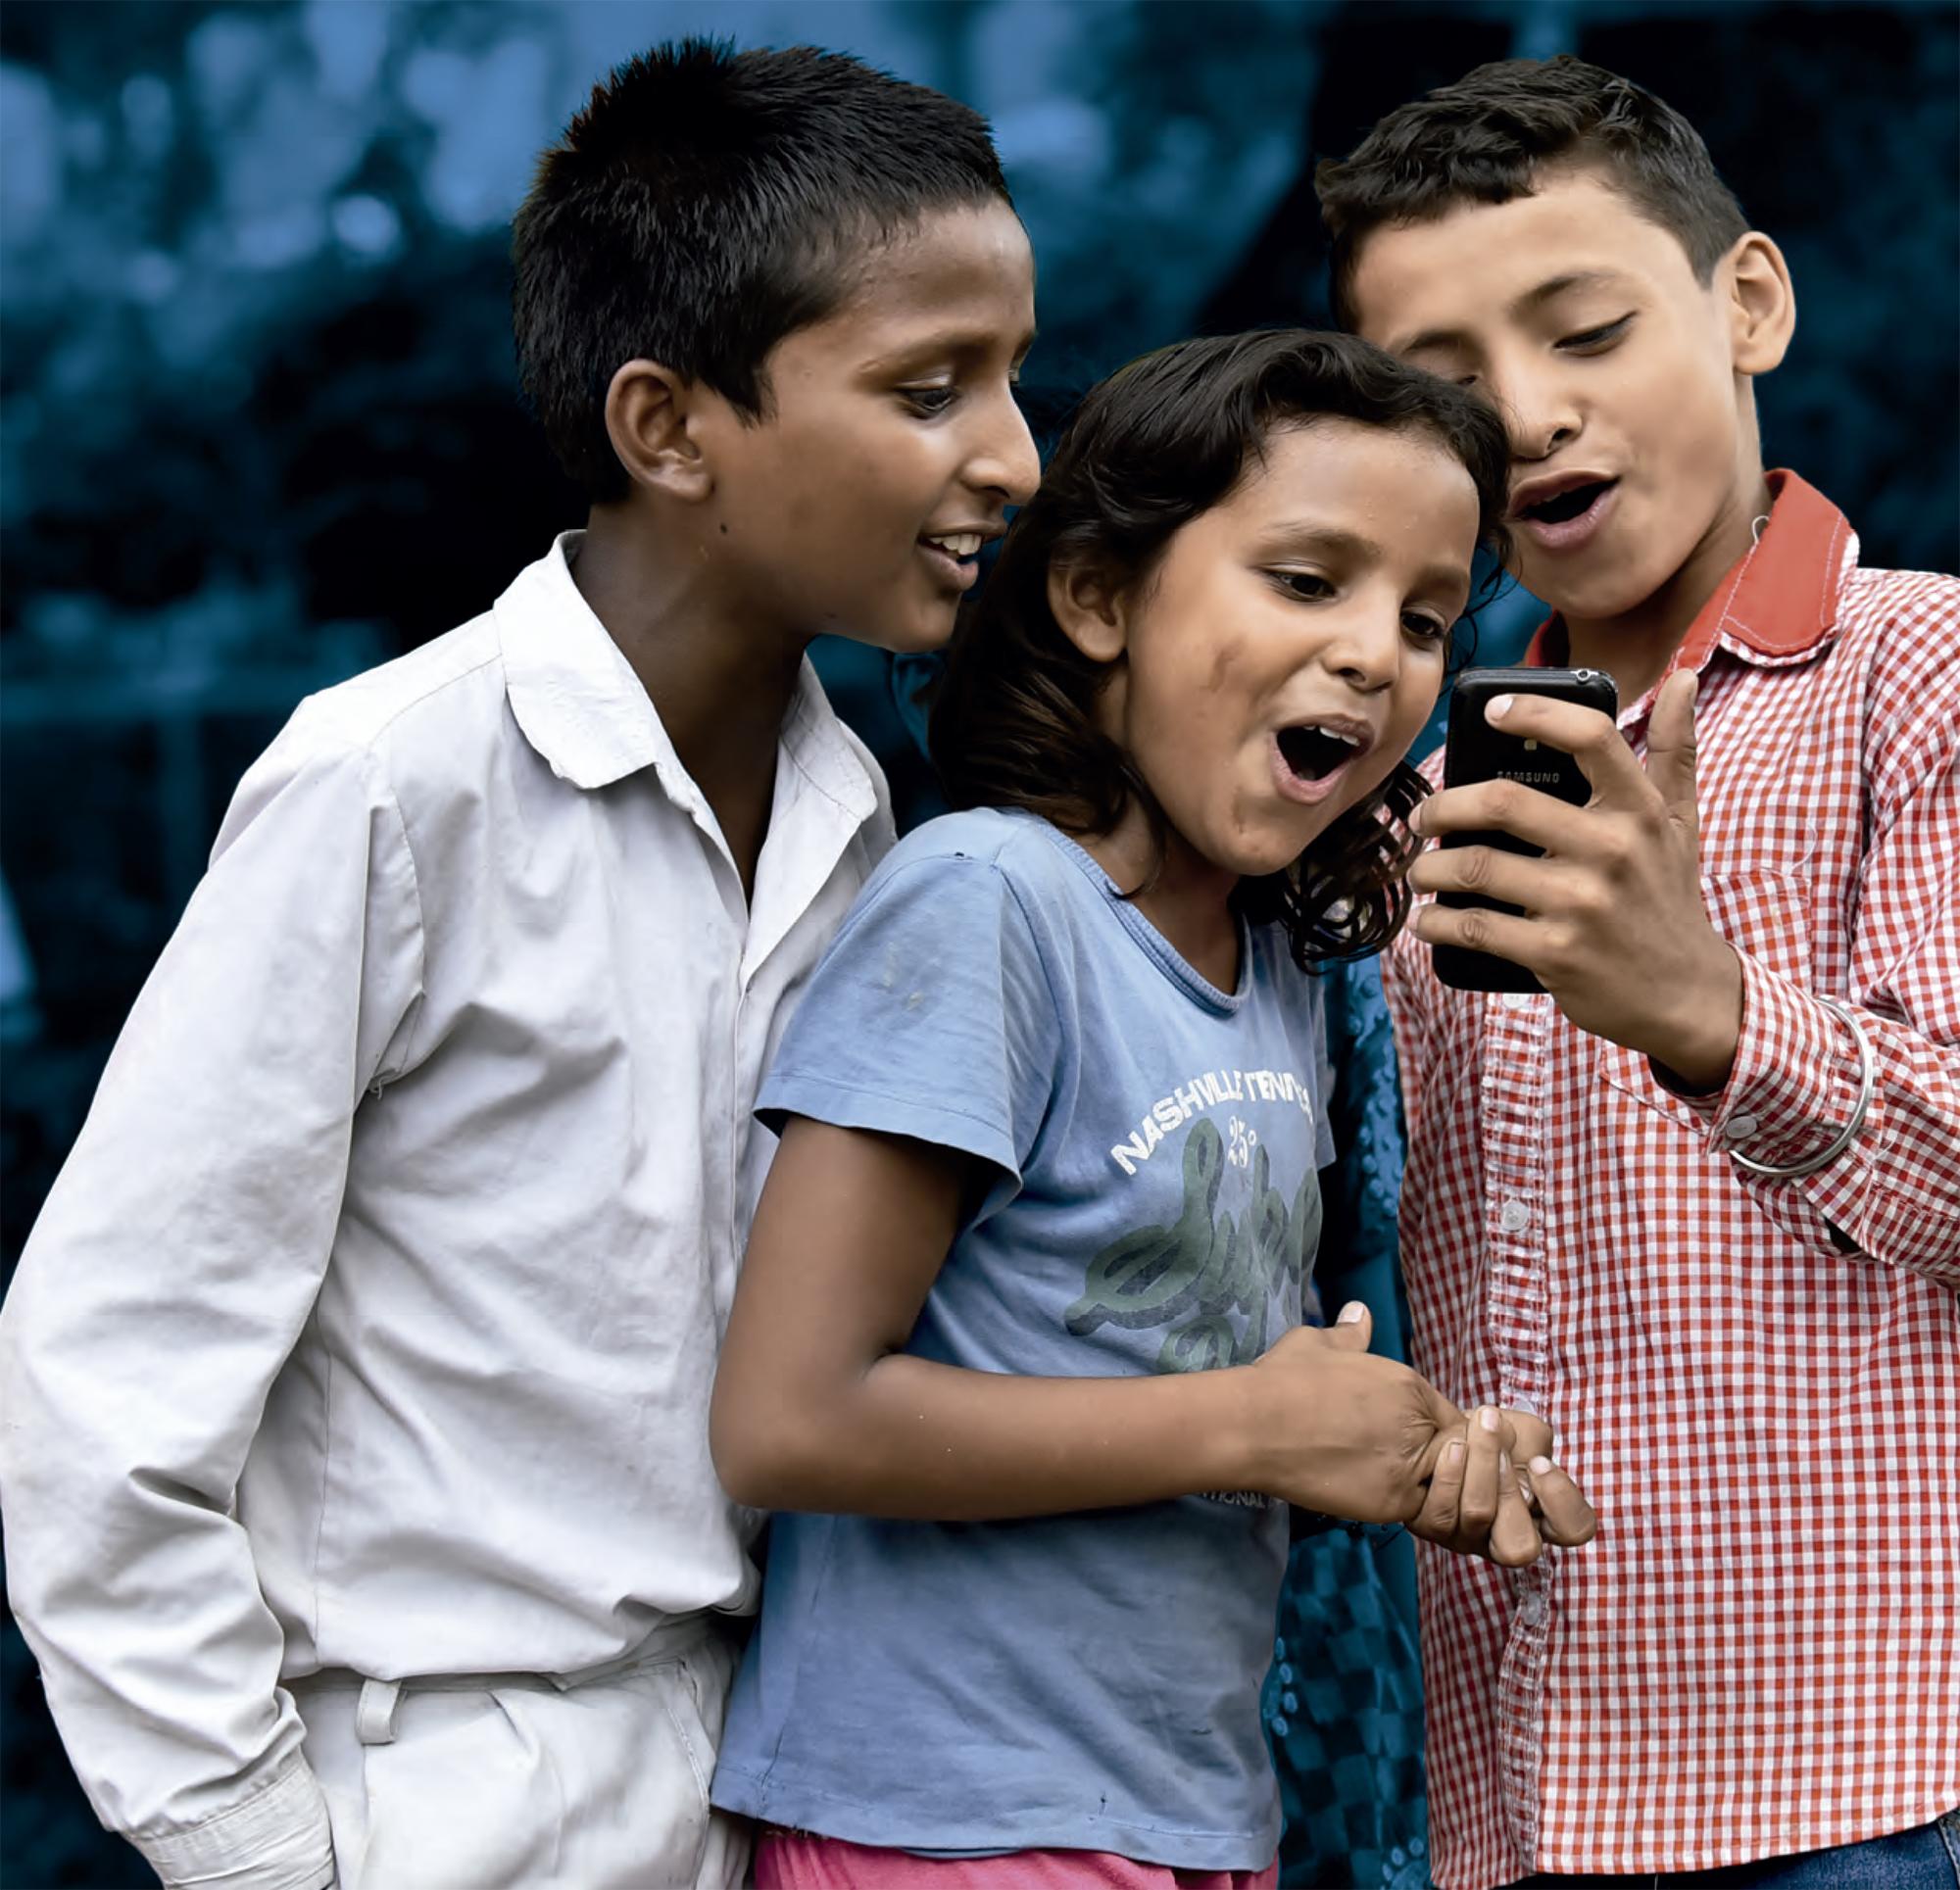 Estado mundial de la infancia 2017_foto 1